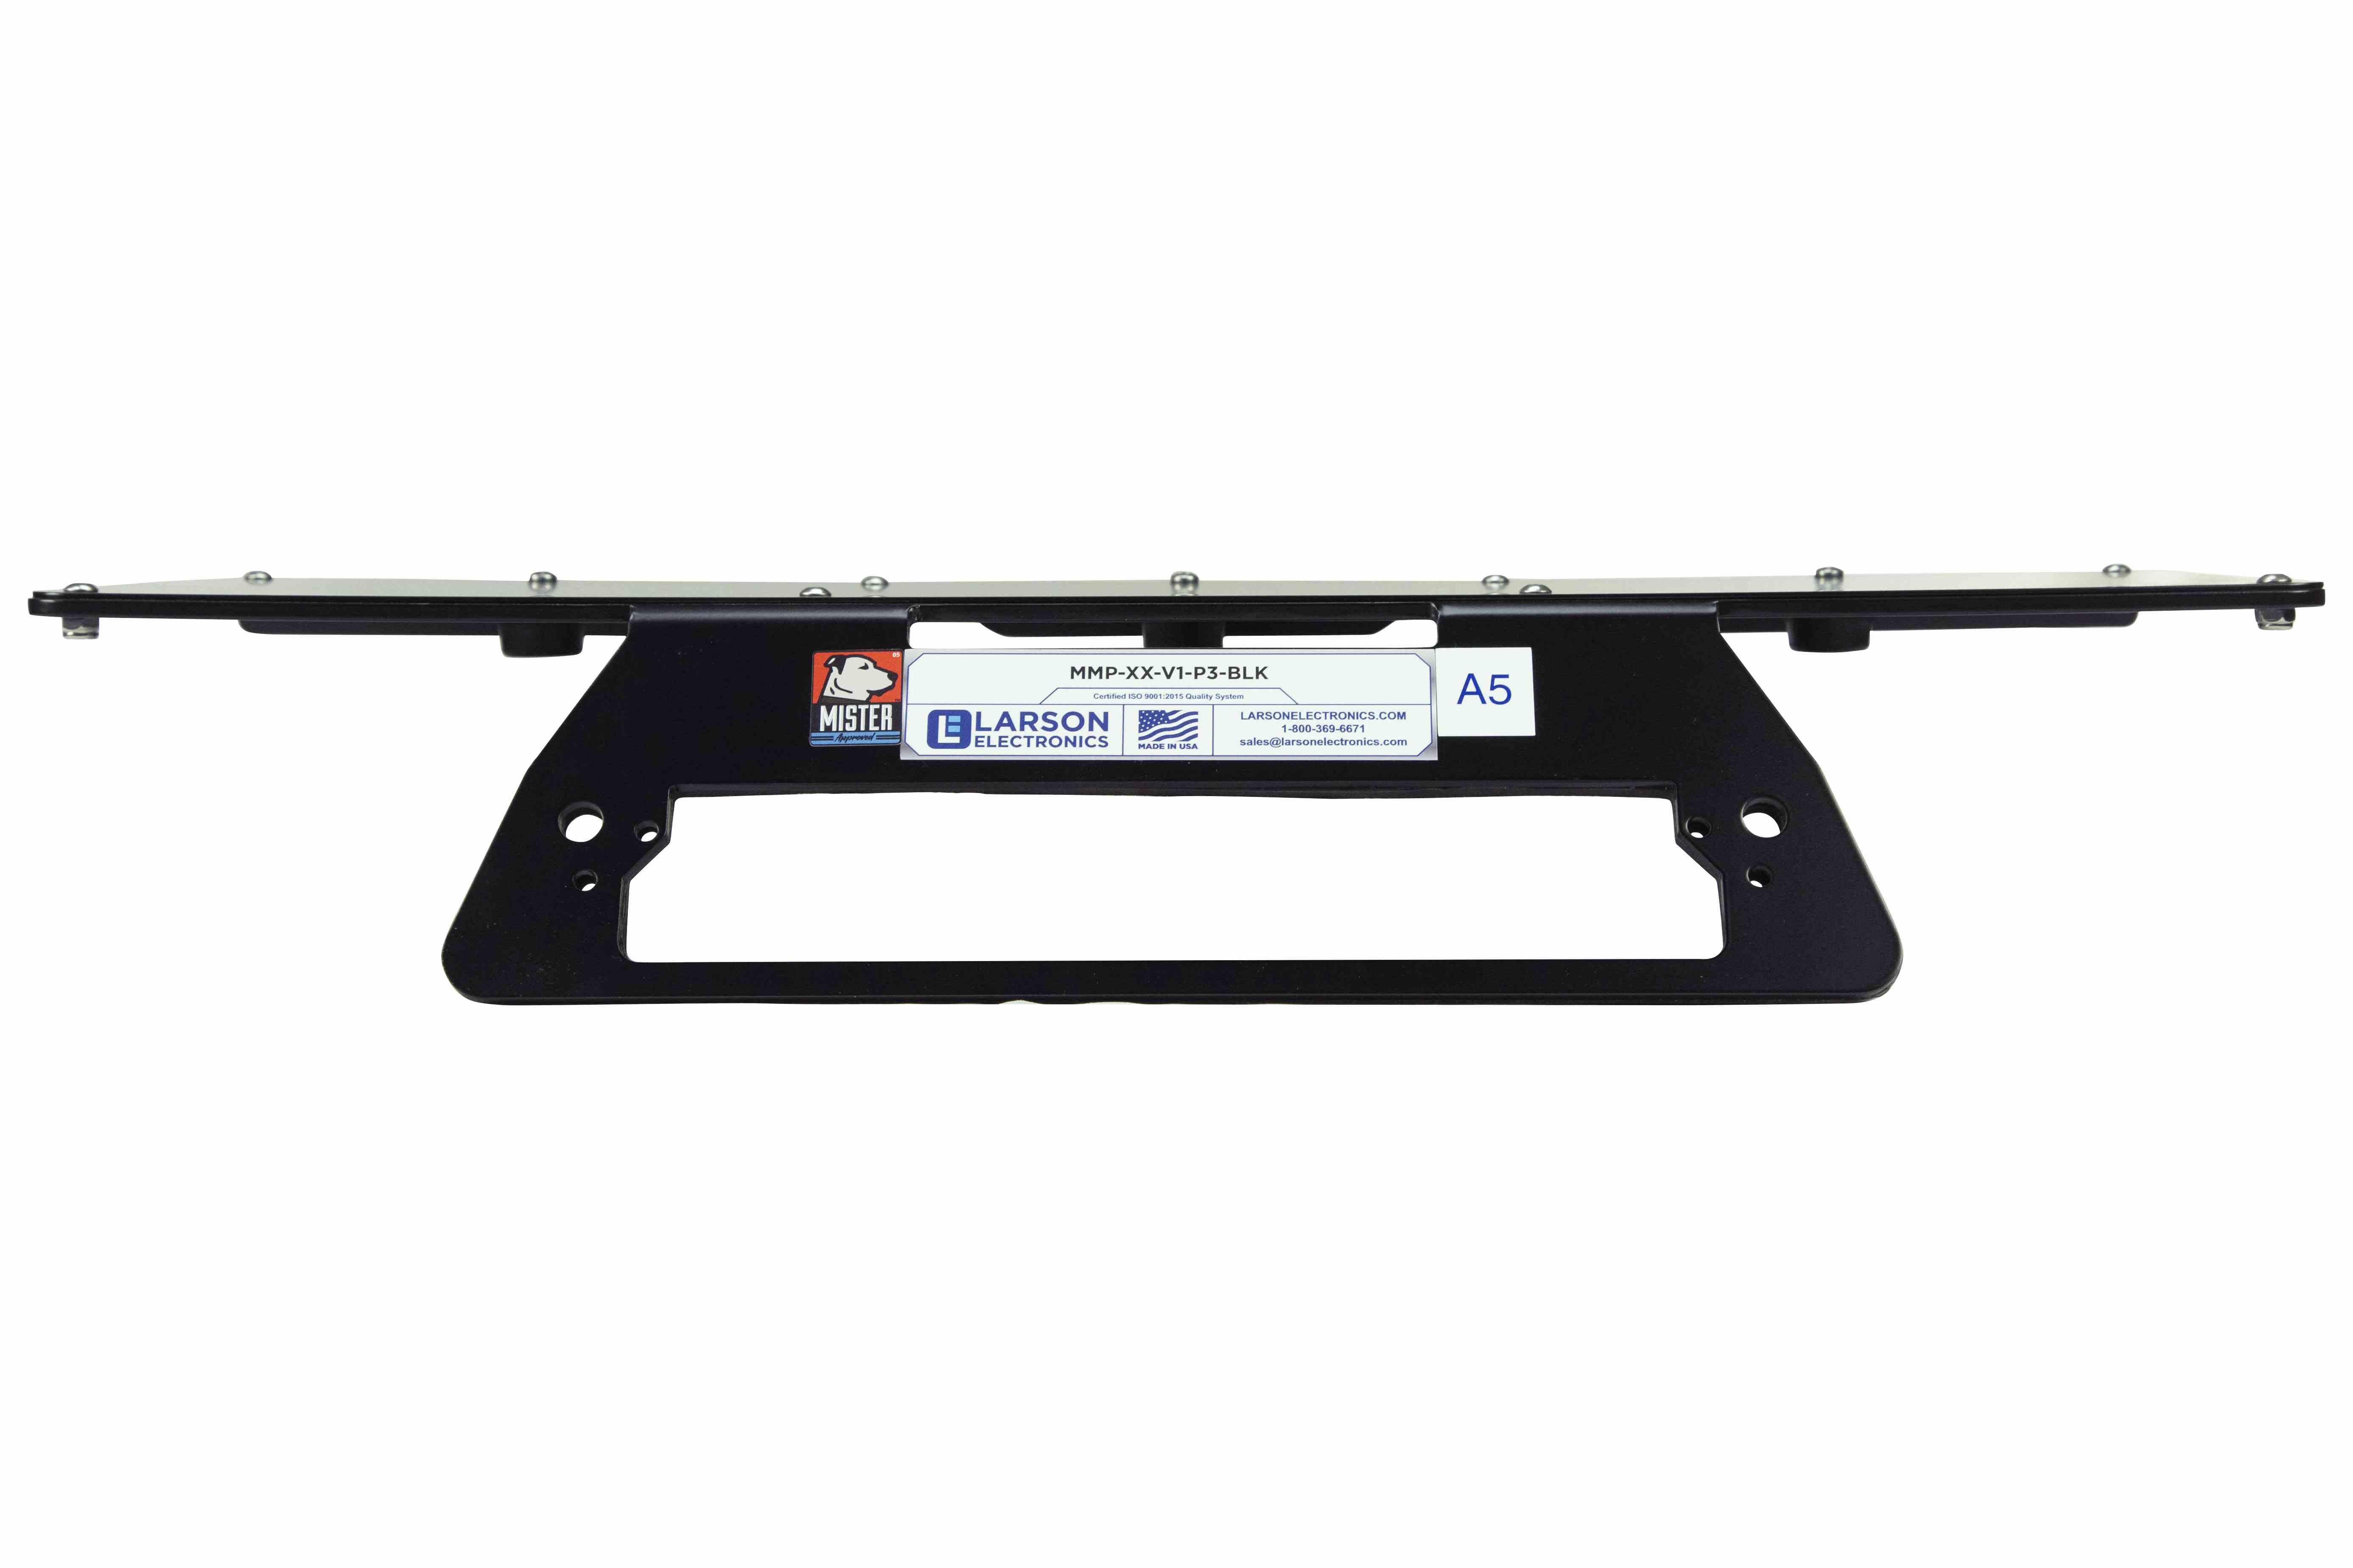 Chevrolet Silverado HD HD HD NoDrill - Silverado rectangular coffee table